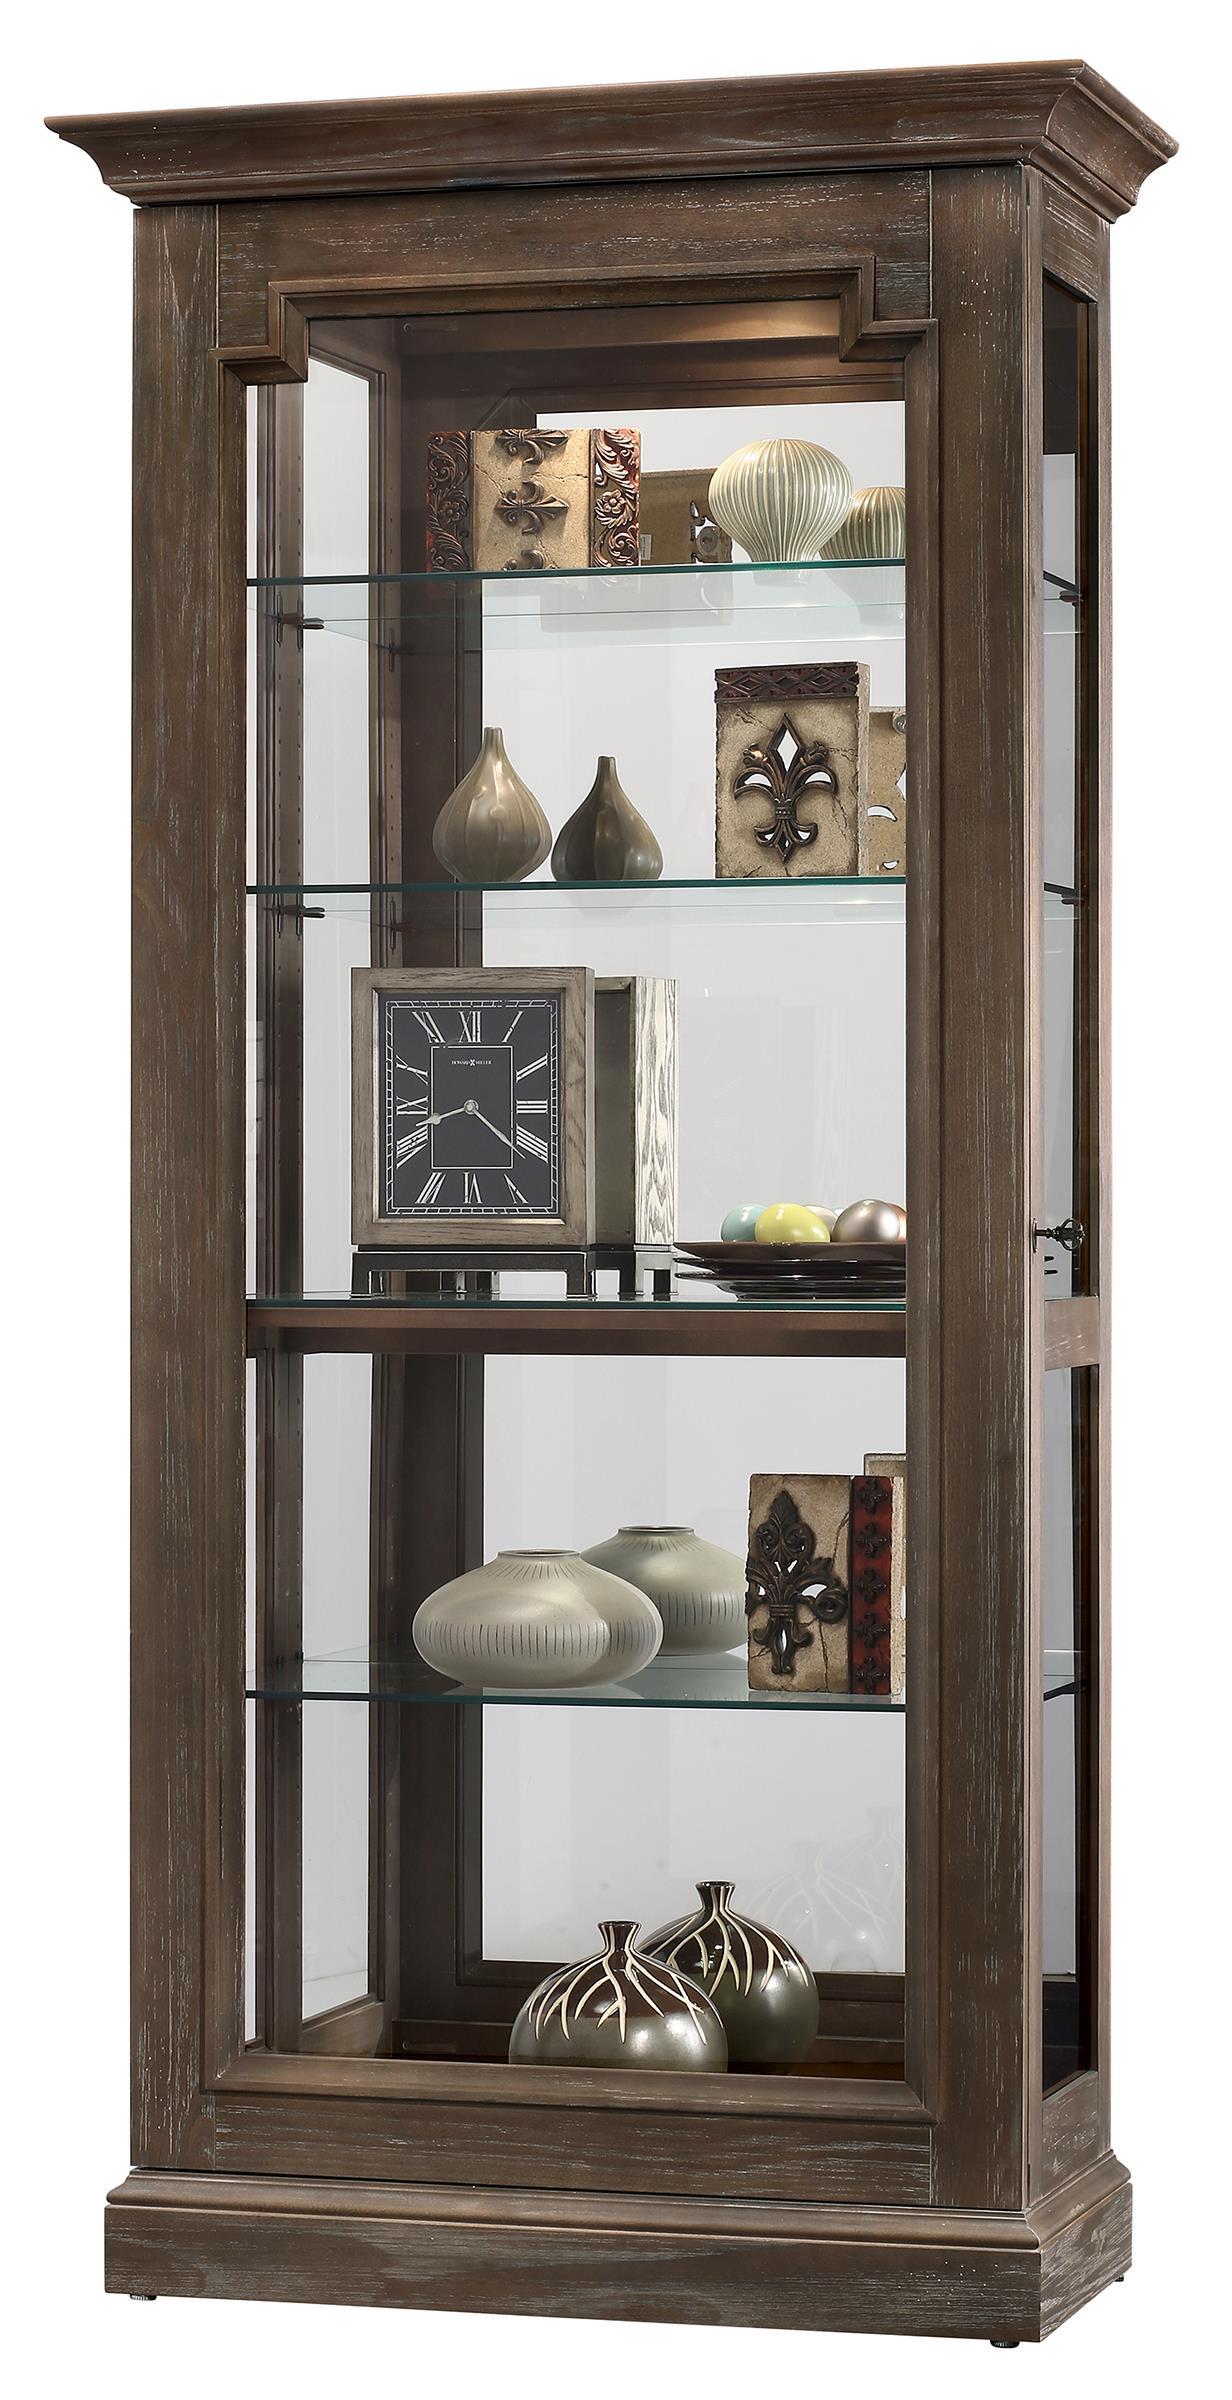 Howard Miller Cabinets Caden II Curio Cabinet - Item Number: 680-608